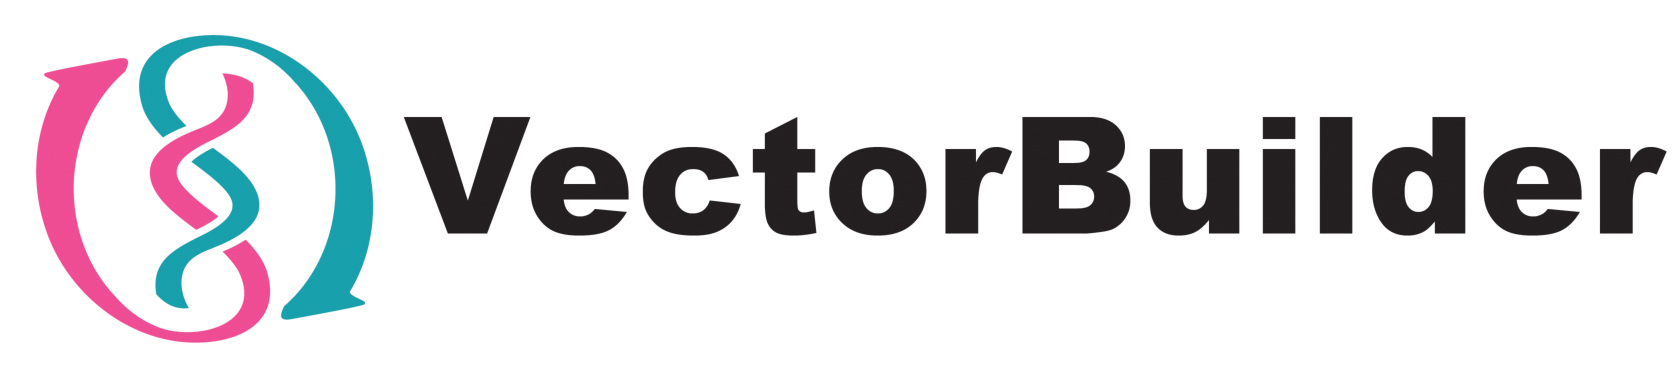 Vectorbuilder.jpg